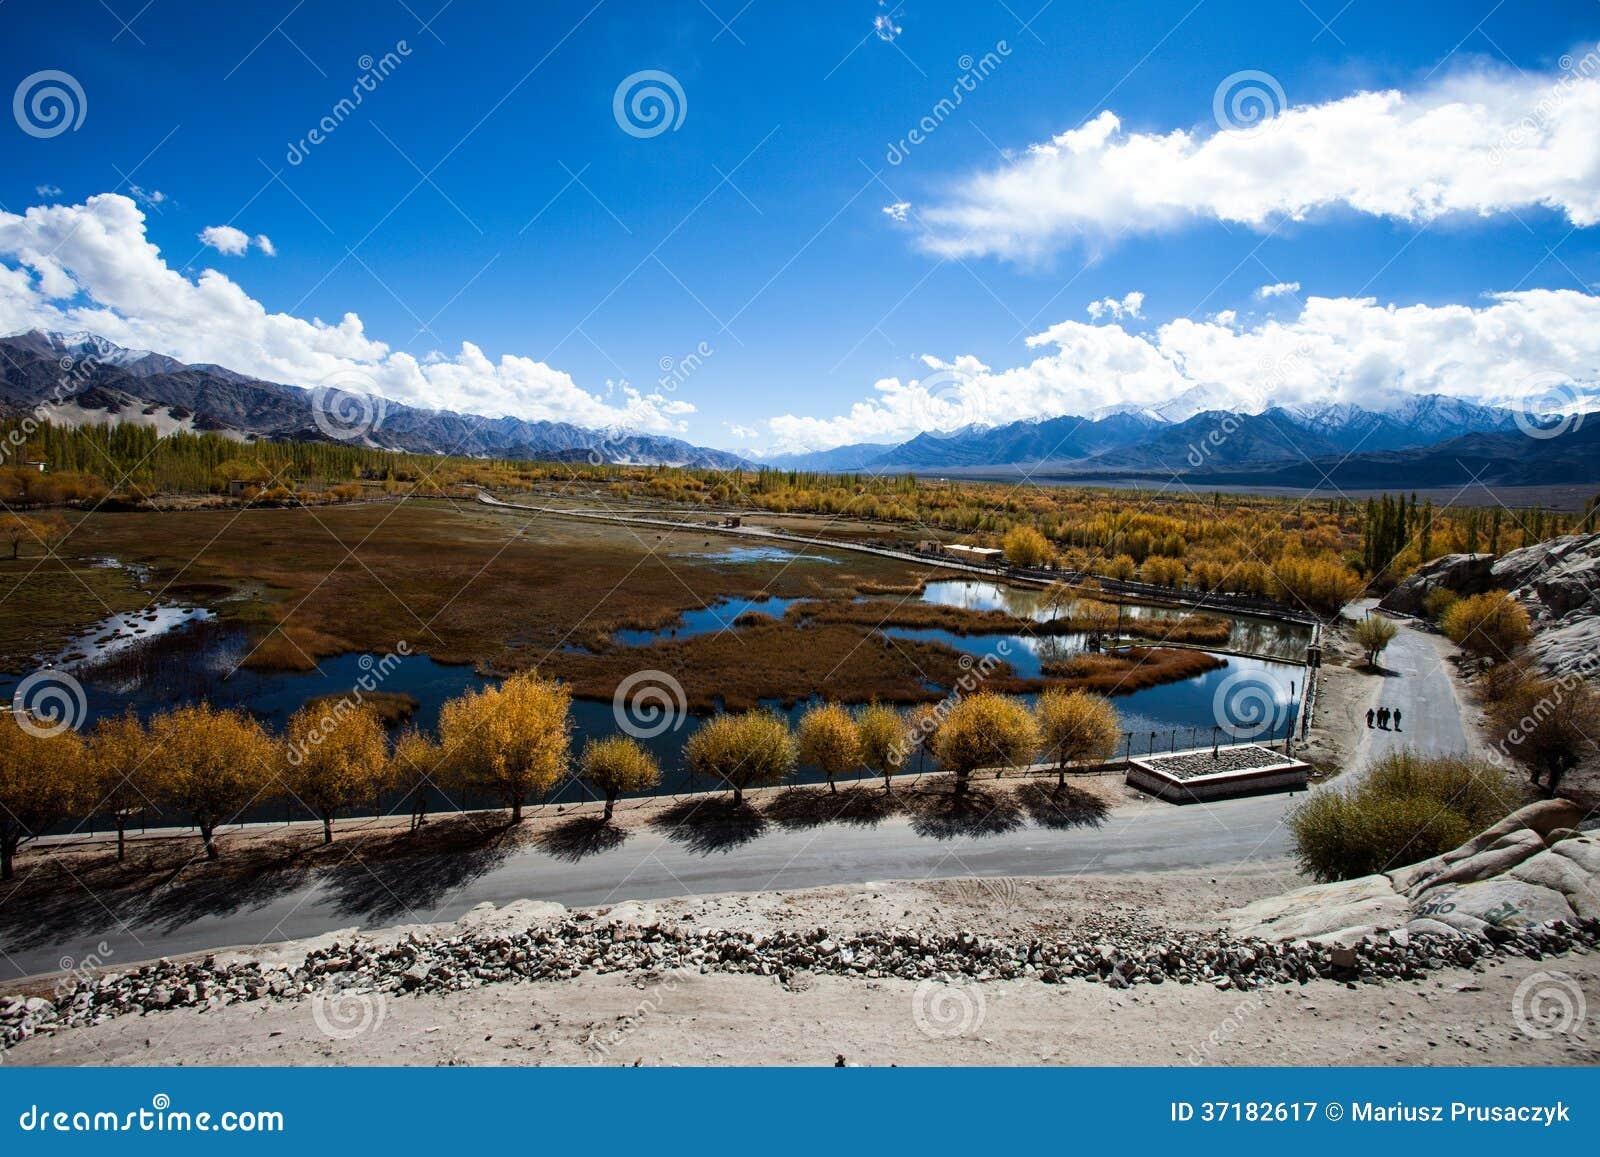 Beautiful scenery leh ladakh jammu and kashmir india royalty free stock photography